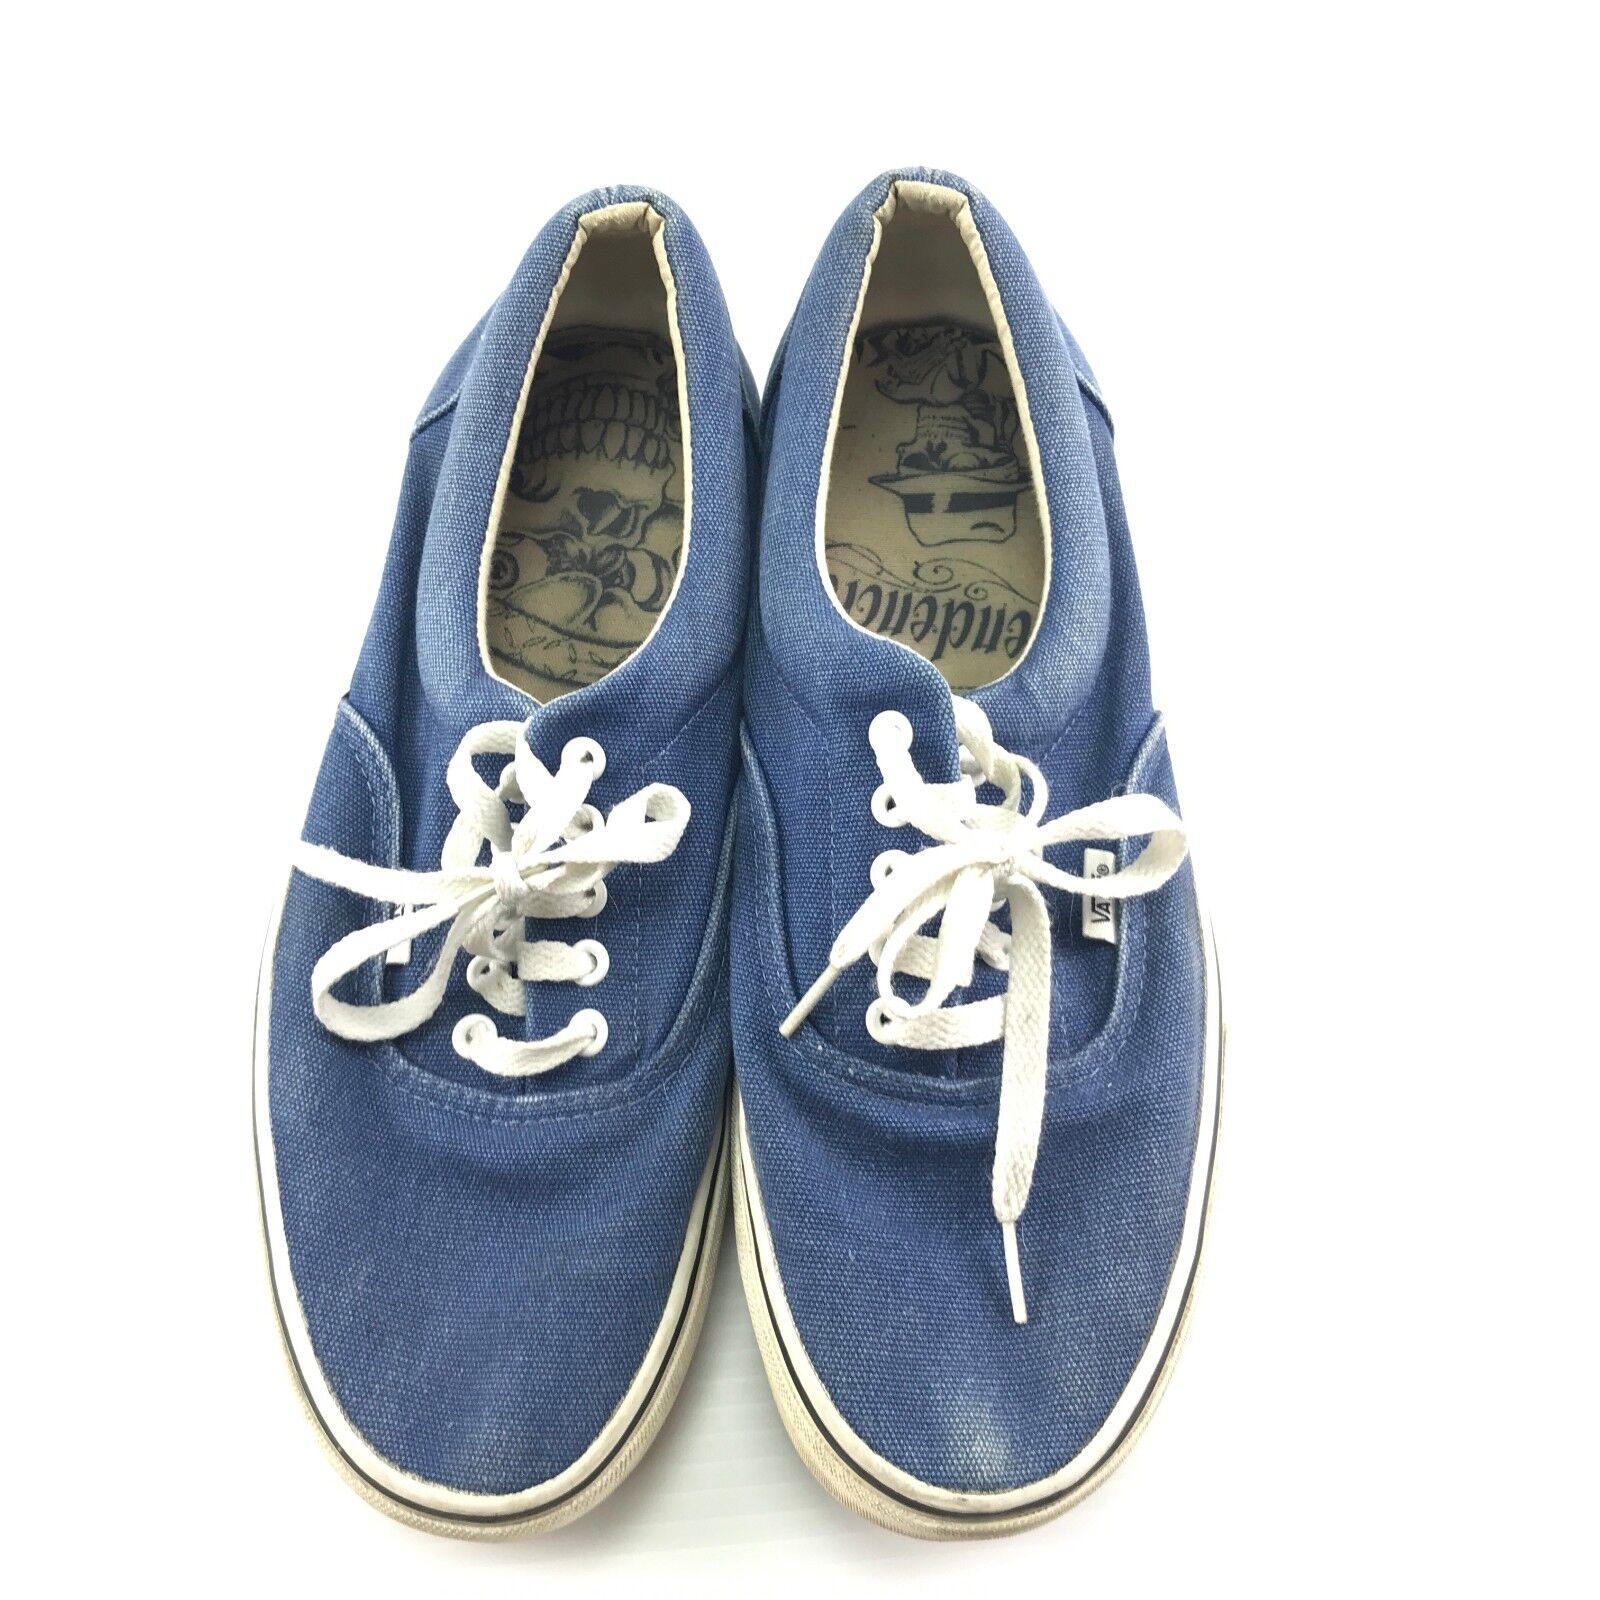 Vans Suicidal Tendencies Mens VTG Blue Lace Up Skate Sneakers Size 11.5